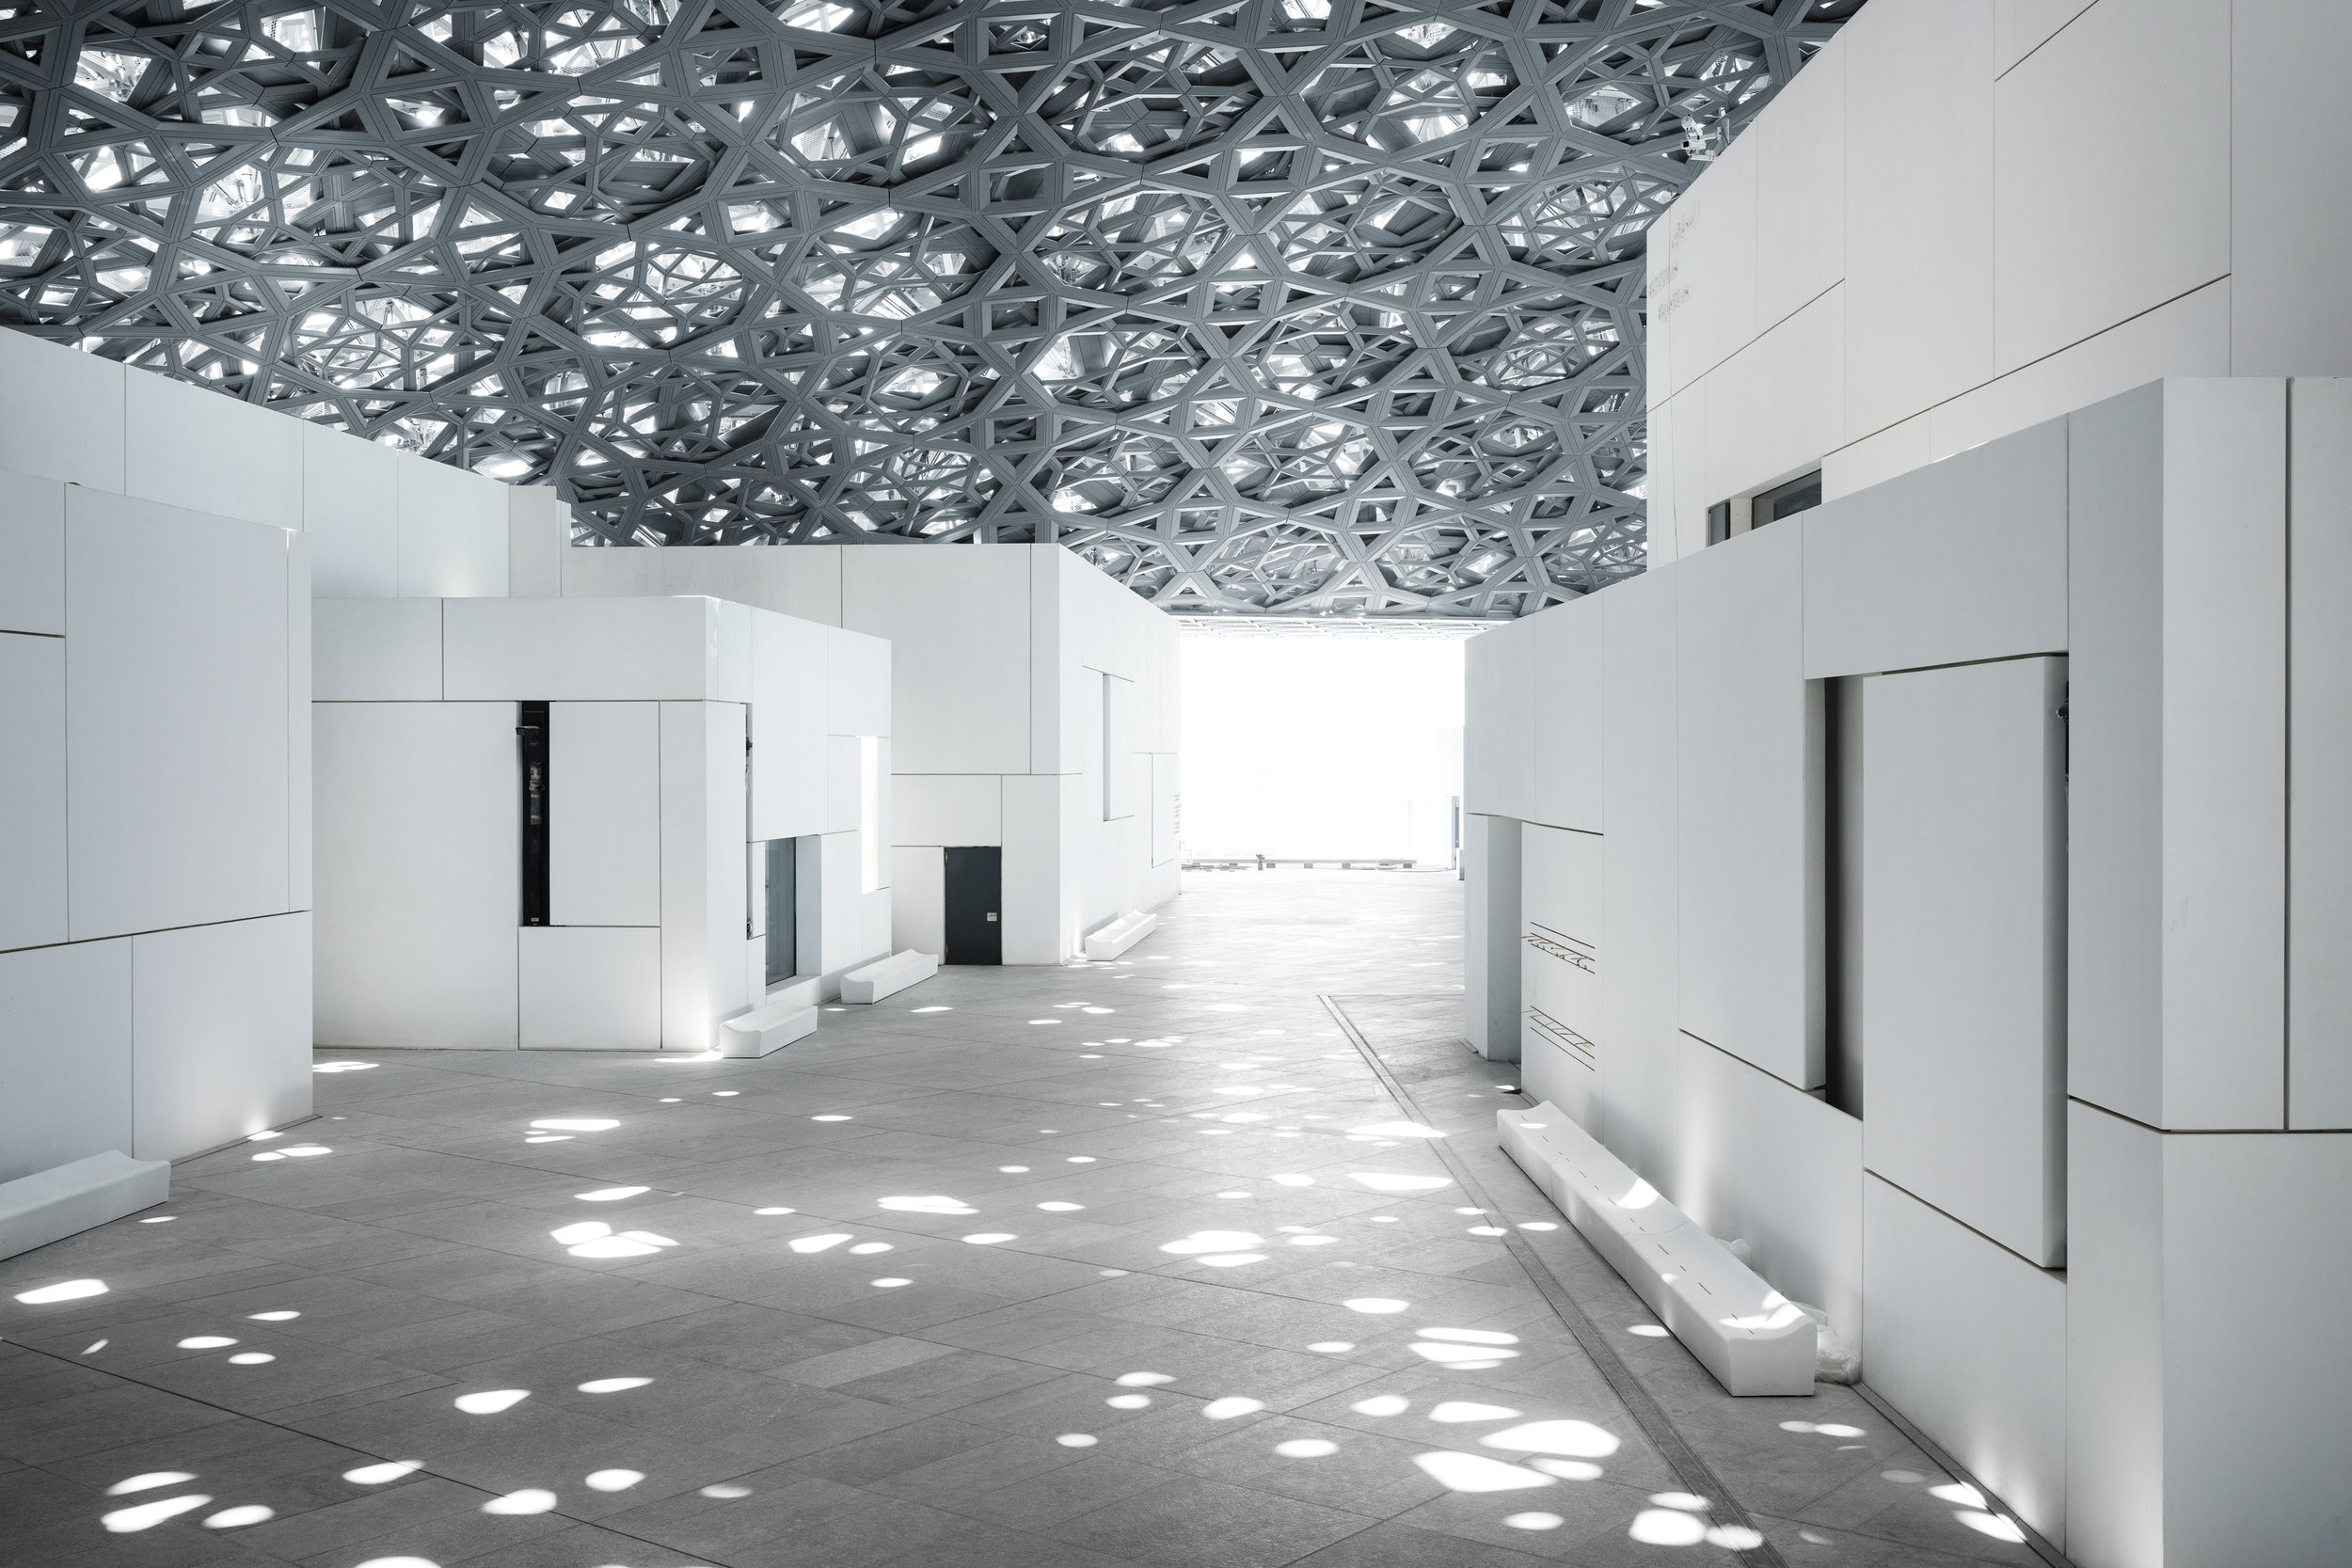 Louvre Abu Dhabi's  Rain of Light  © Louvre Abu Dhabi, Photography: Mohamed Somji